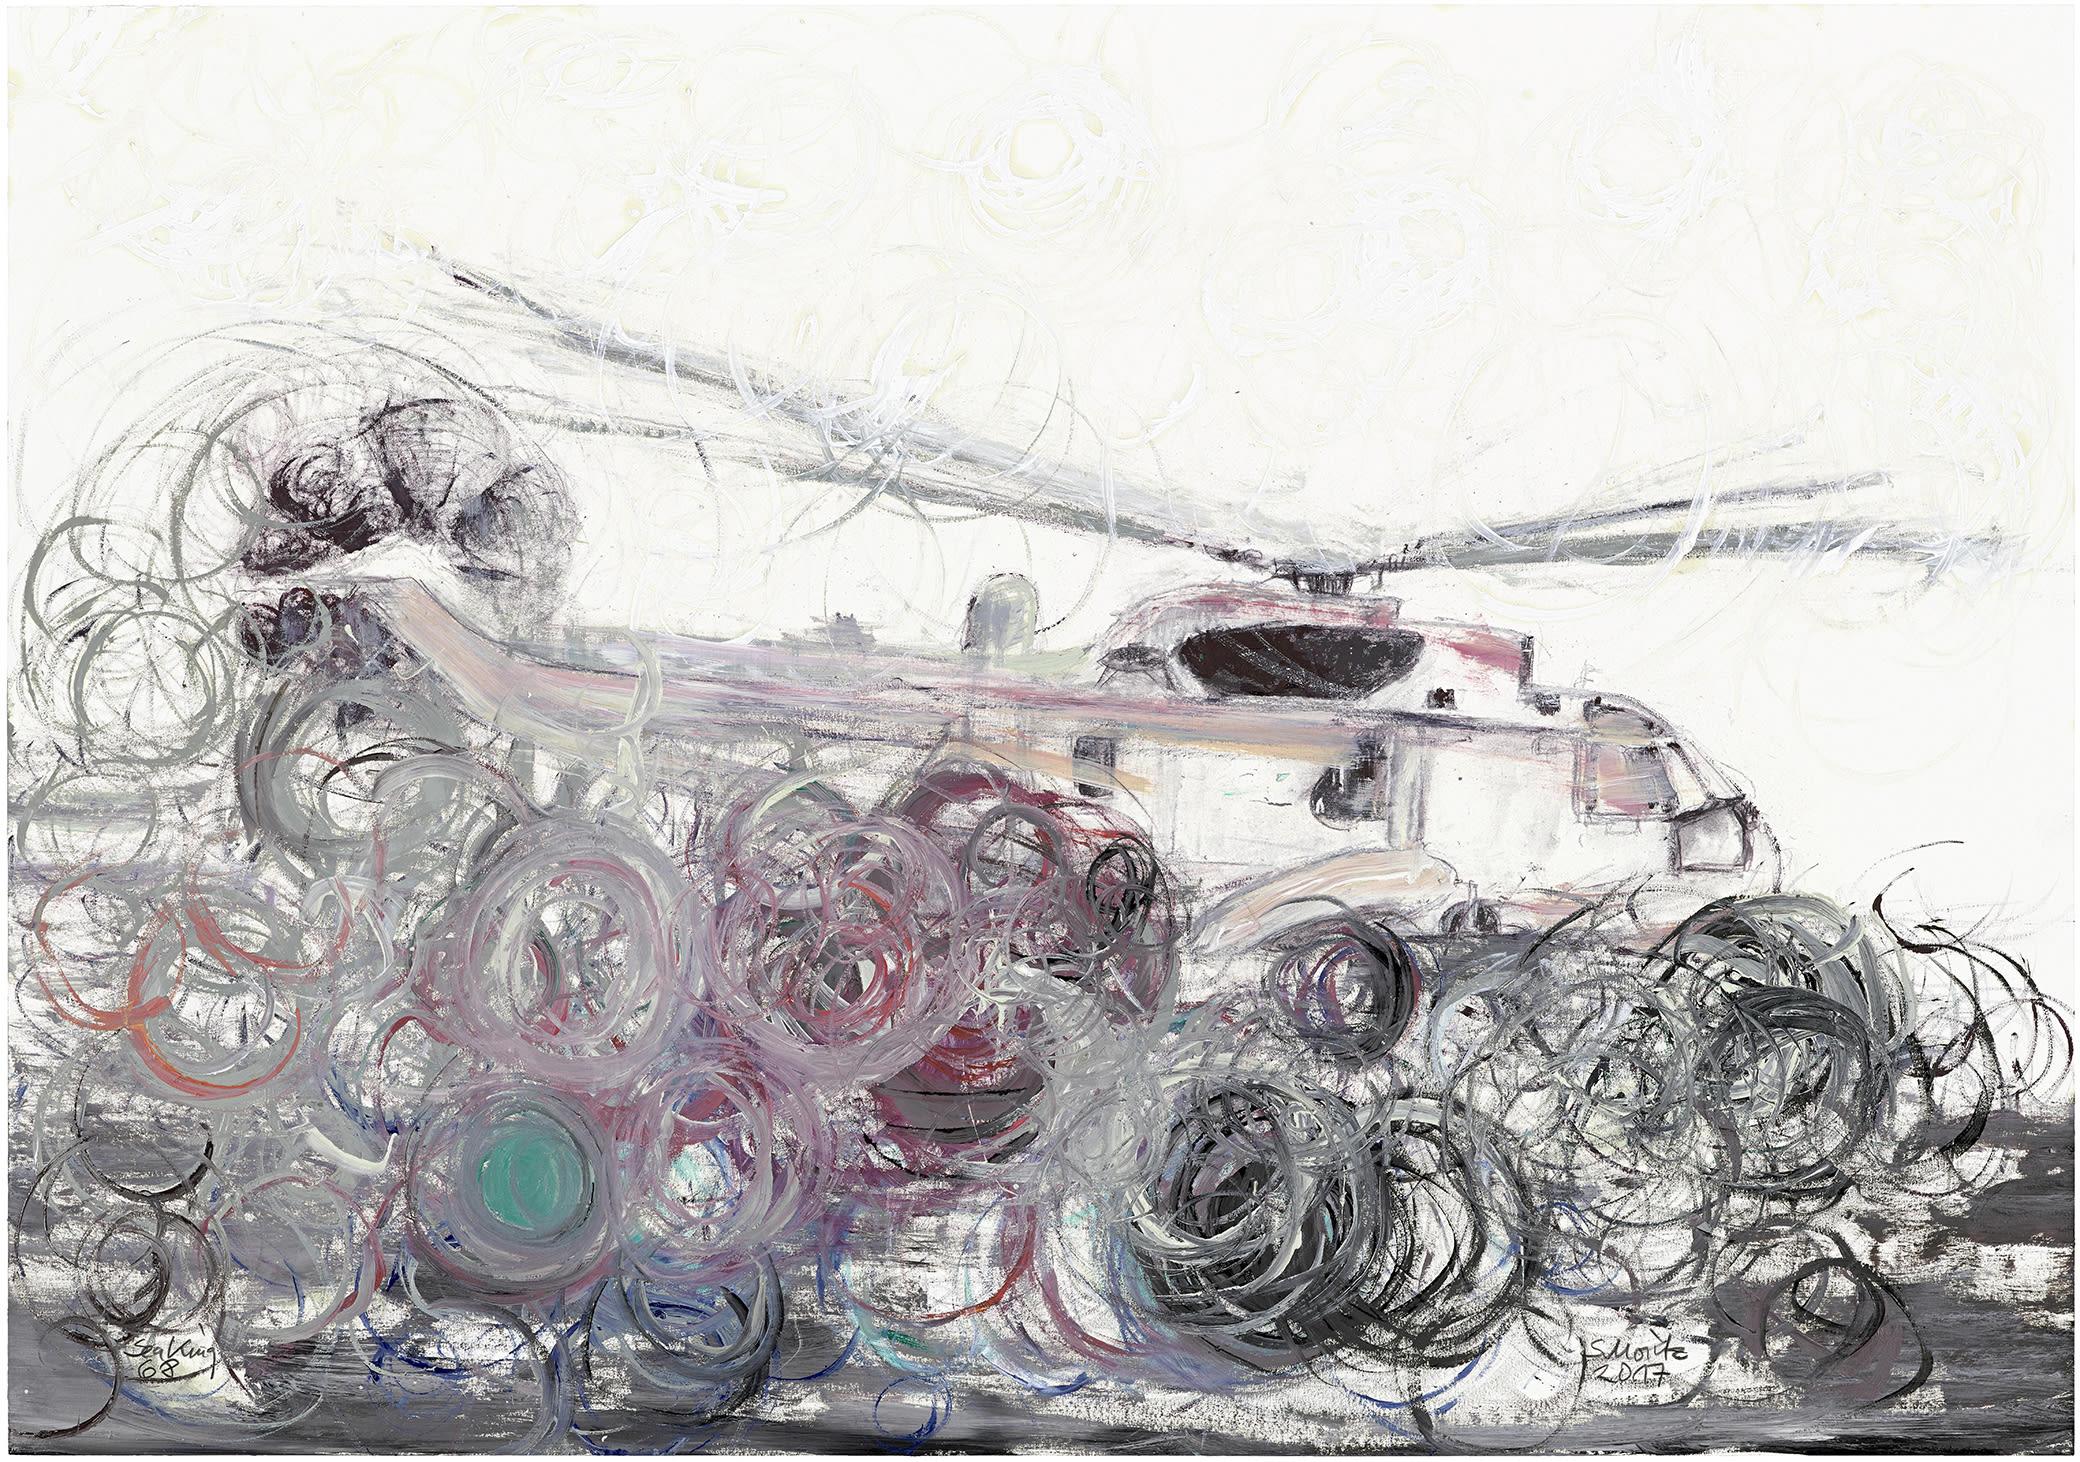 Sabine Moritz, Sea King 68, 2017